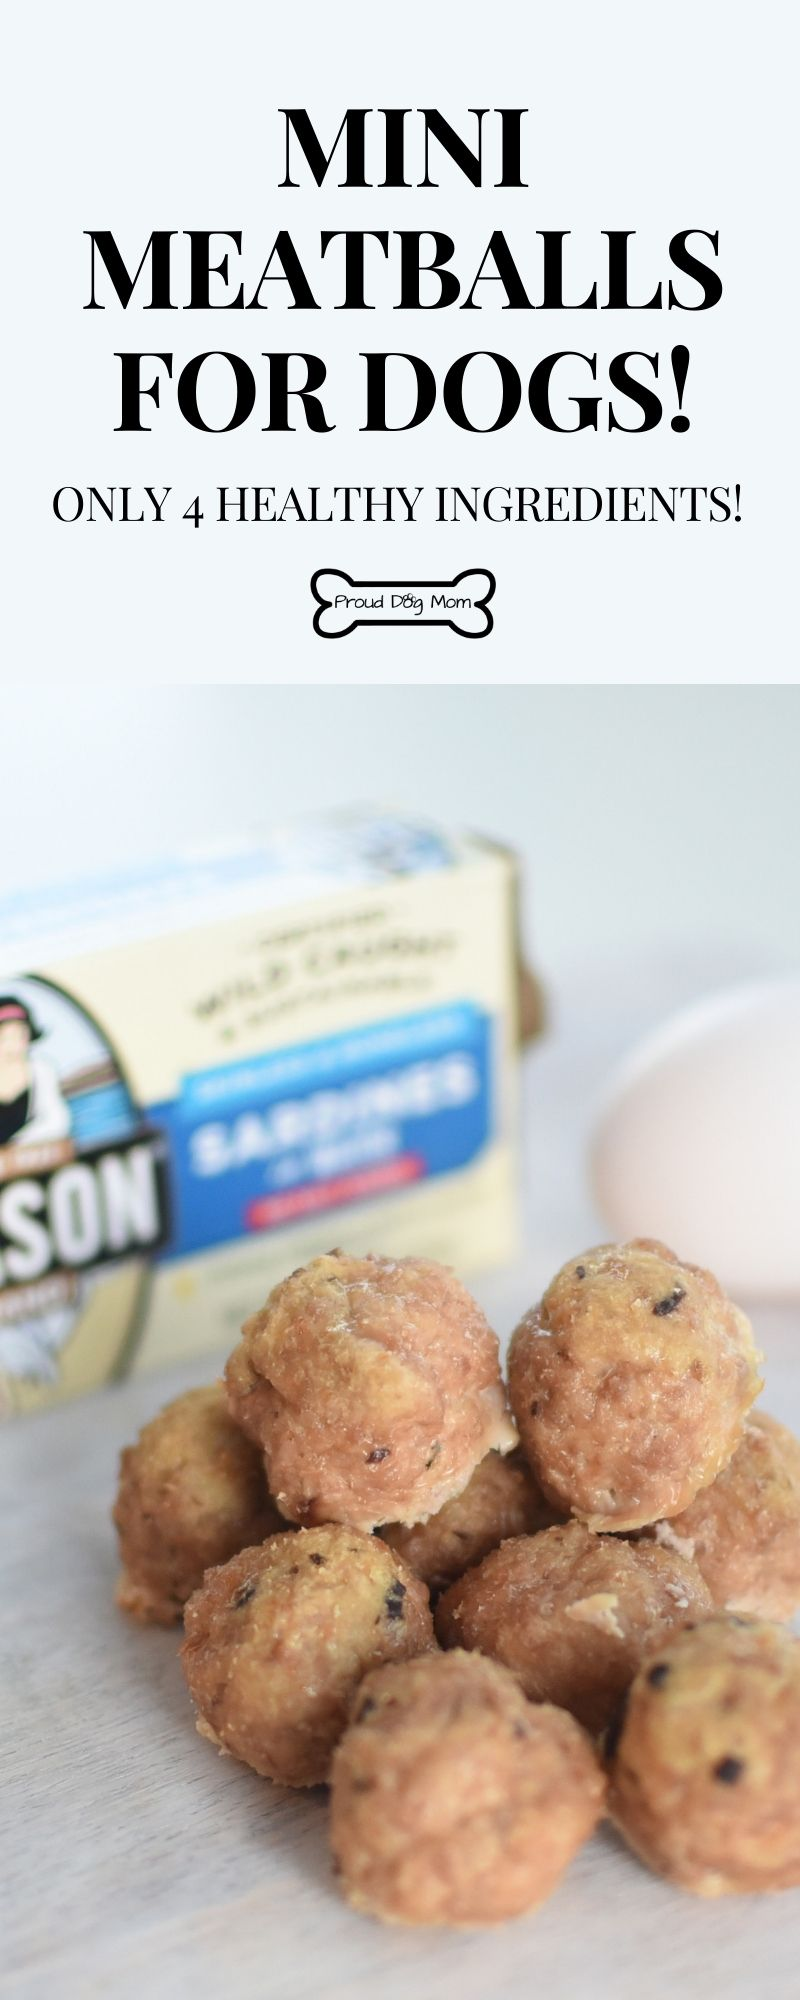 4 Ingredient Doggy Meatballs Recipe Dog Treats Grain Free Dog